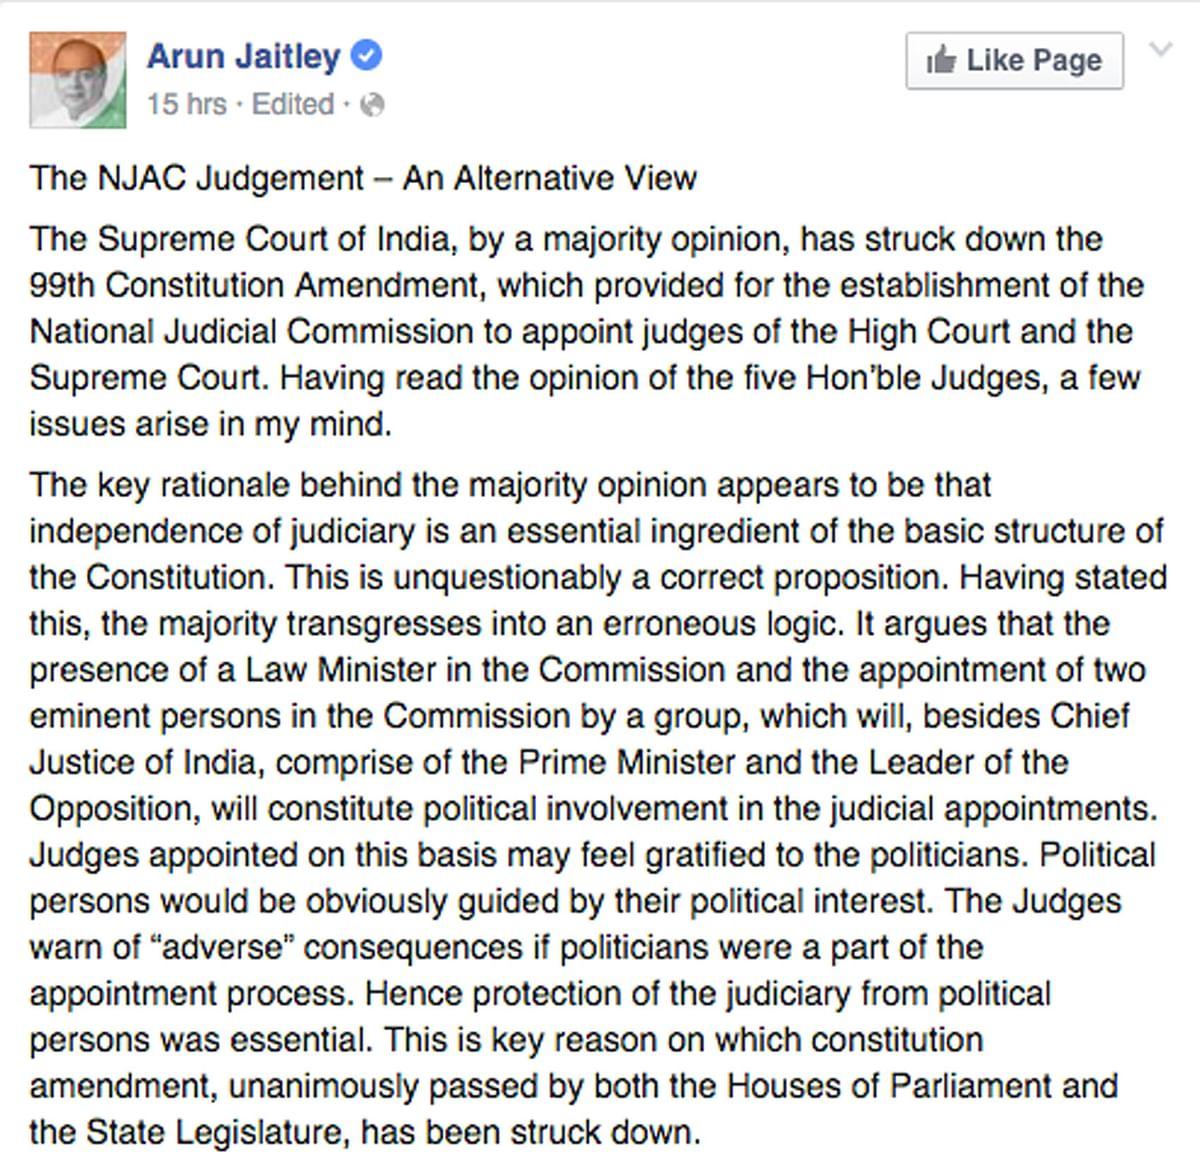 "(Photo: <a href=""https://www.facebook.com/ArunJaitley/posts/418492815005939"">Arun Jaitley's Facebook Post</a>)"